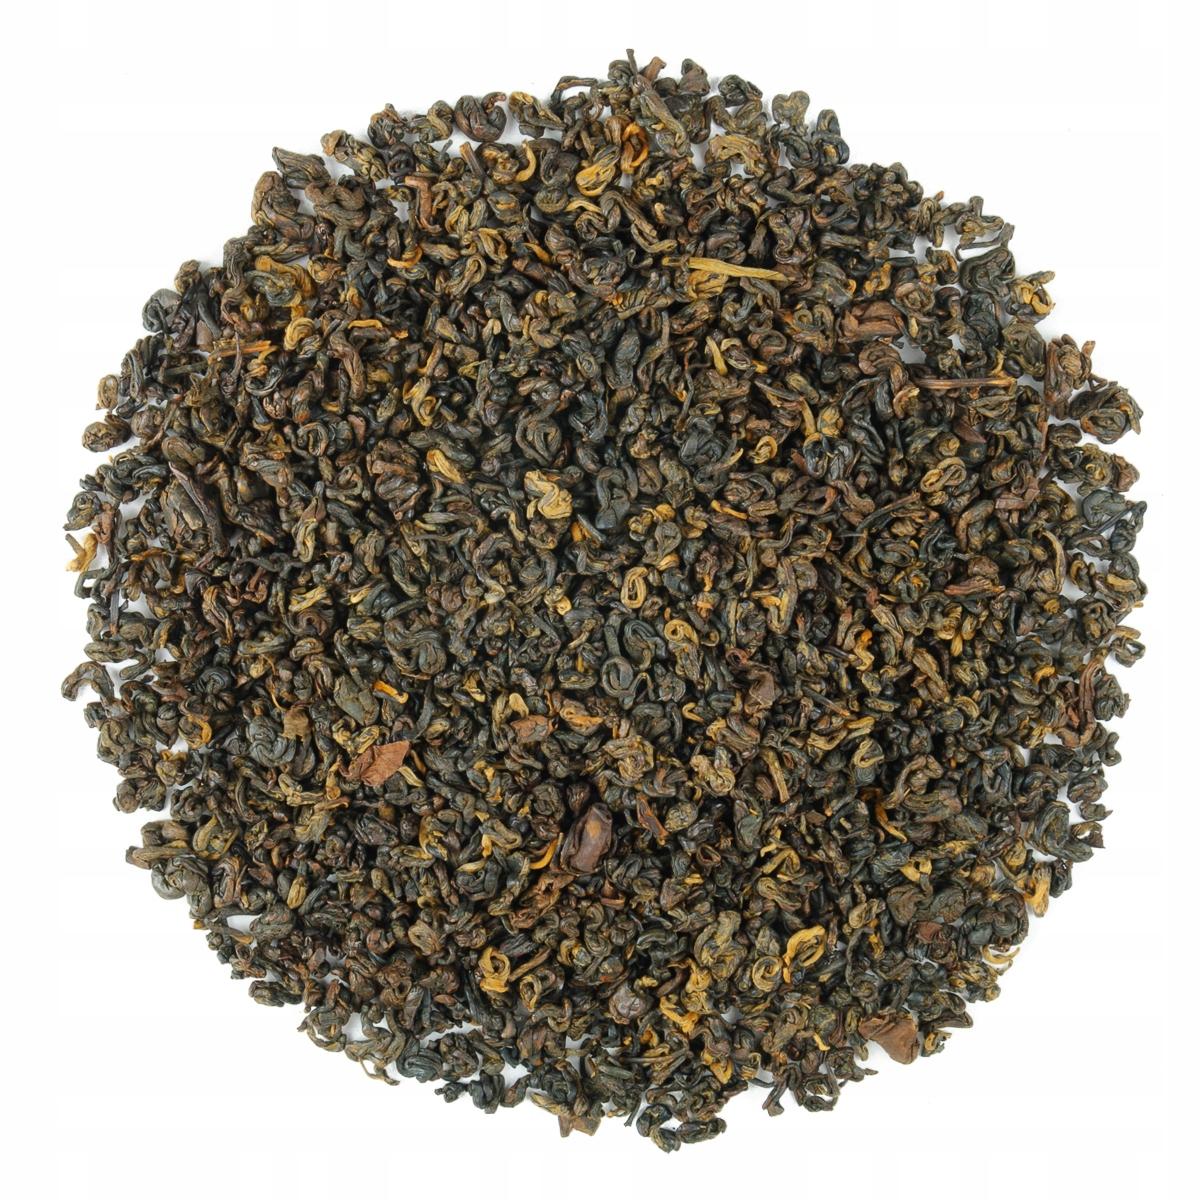 čierny čaj 0,5 kg Yun Ming Čierna